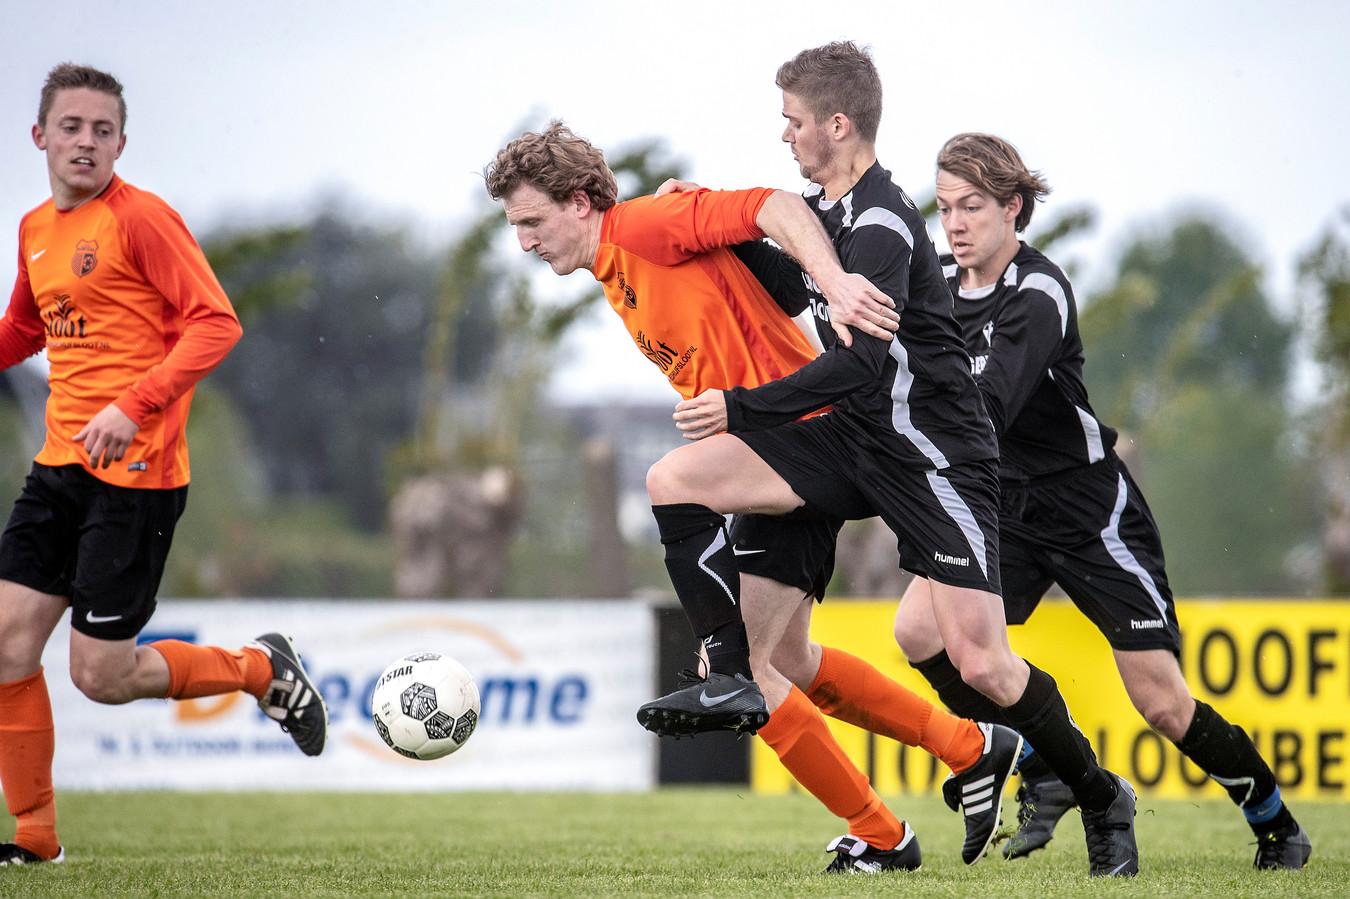 Gelders Eiland had te weinig spelers om te voetballen.